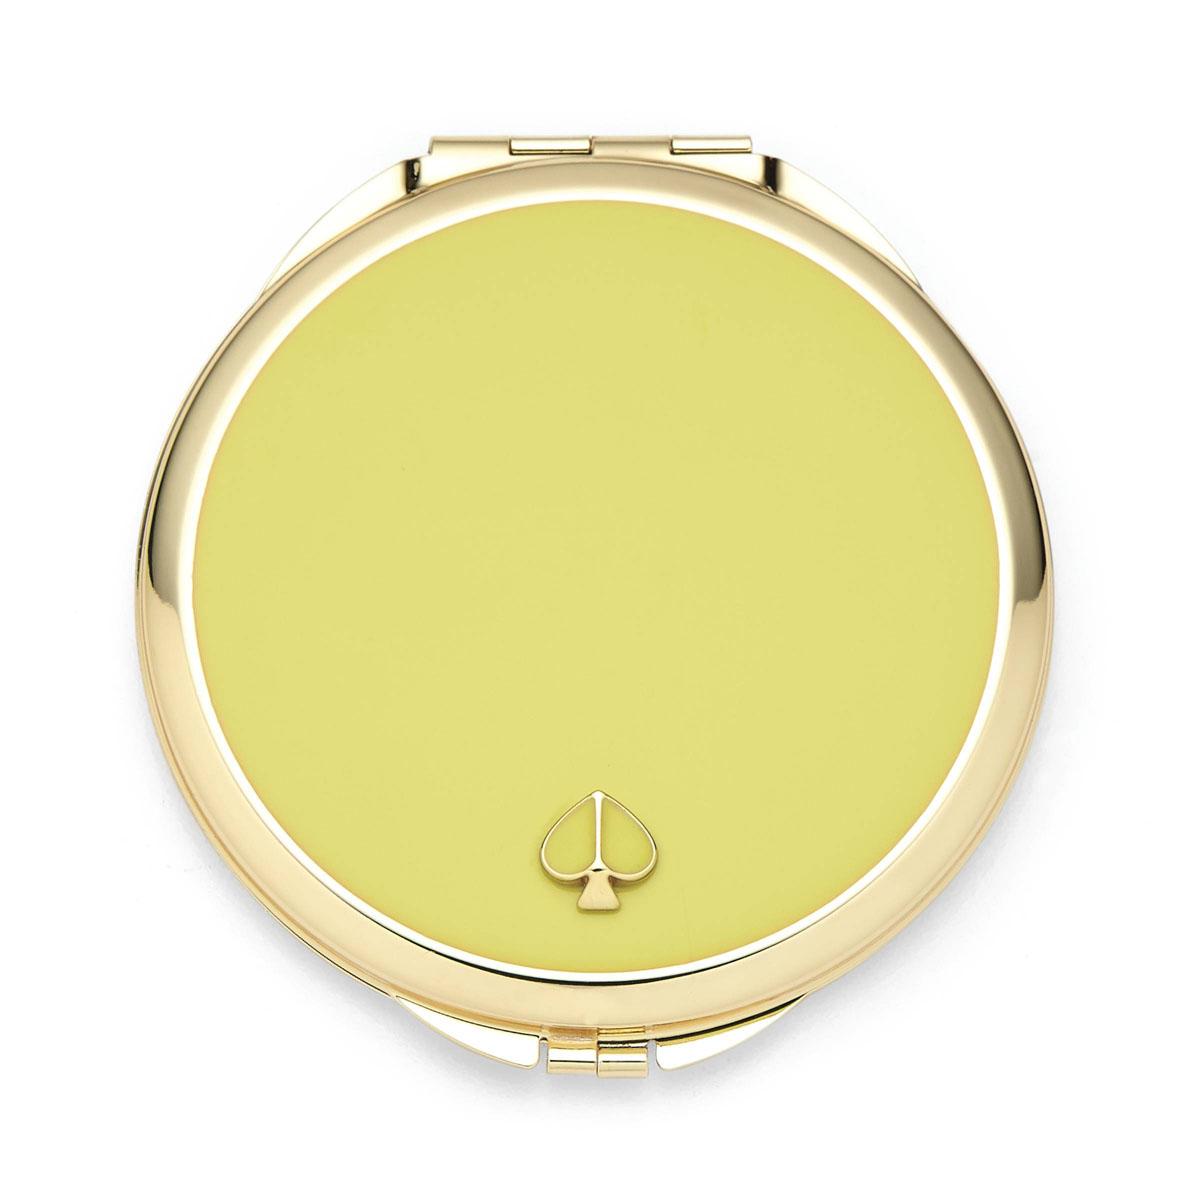 Kate Spade New York, Lenox Spade Street Gold Compact, Citron